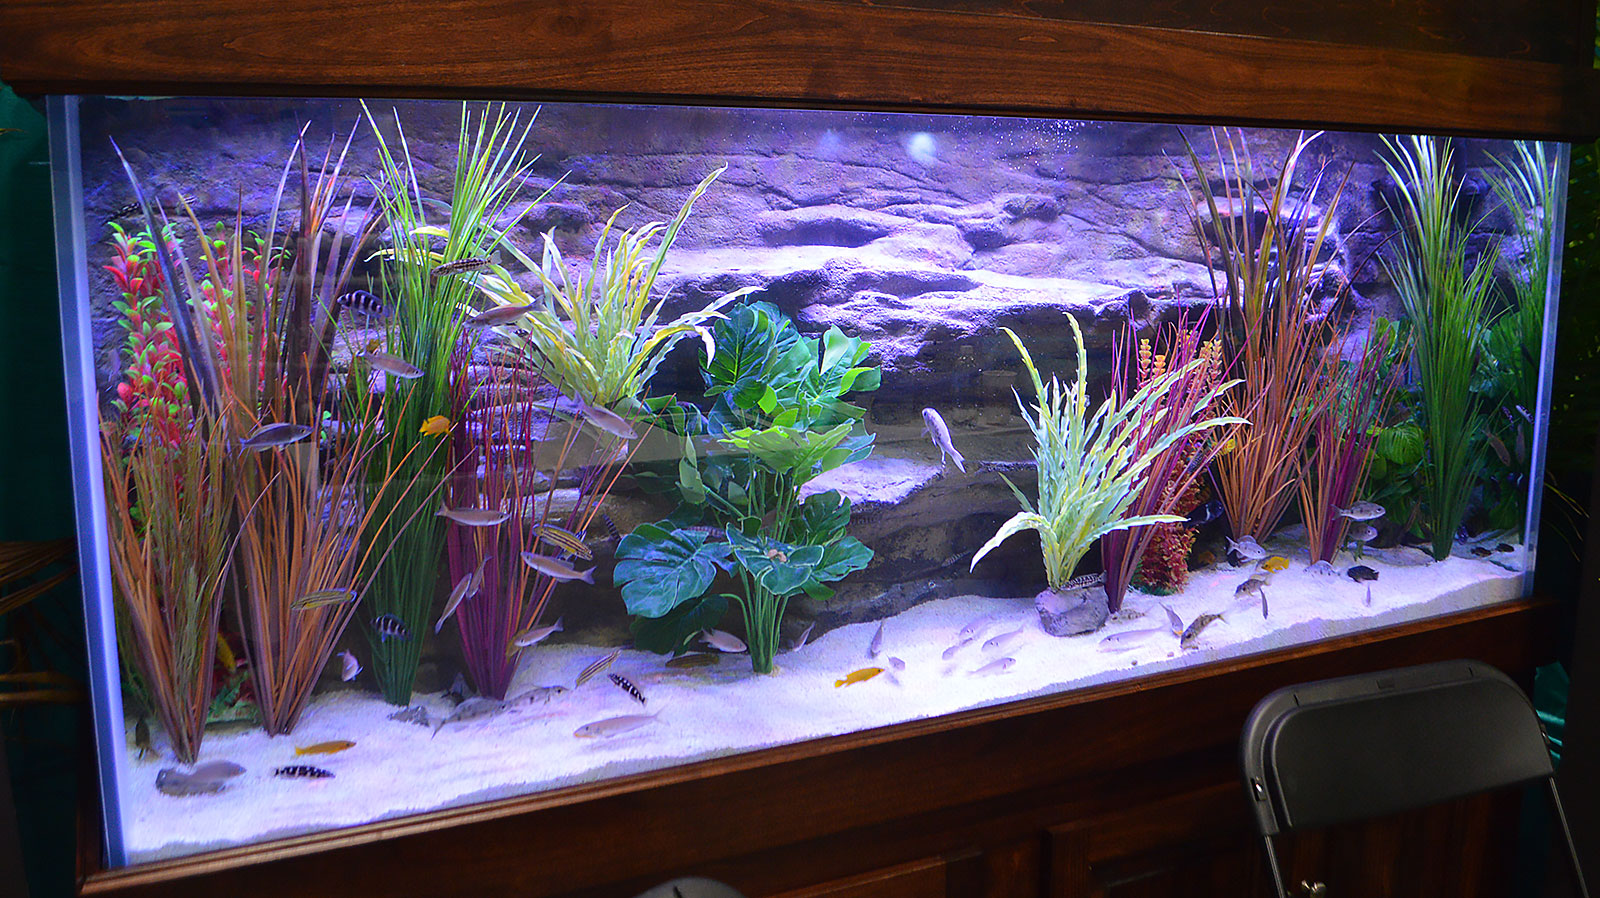 Freshwater aquarium fish exotic - Florida Exotic Fish Sales And Xtreme Aquatic Foods Presented A Display Featuring Tanganyikan Cichlids